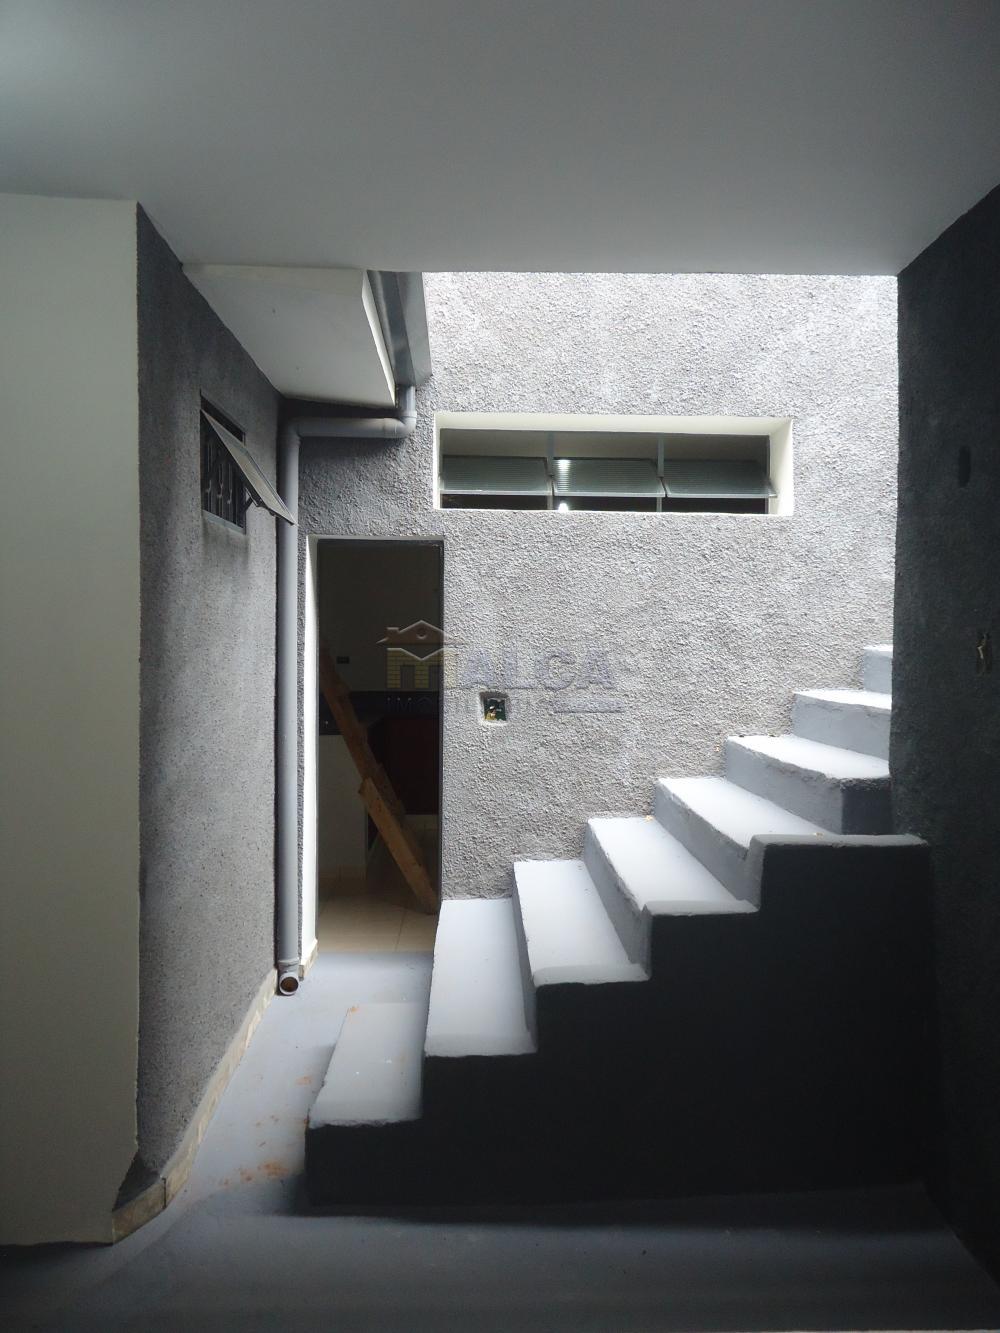 Área Externa (Casa de Baixo)